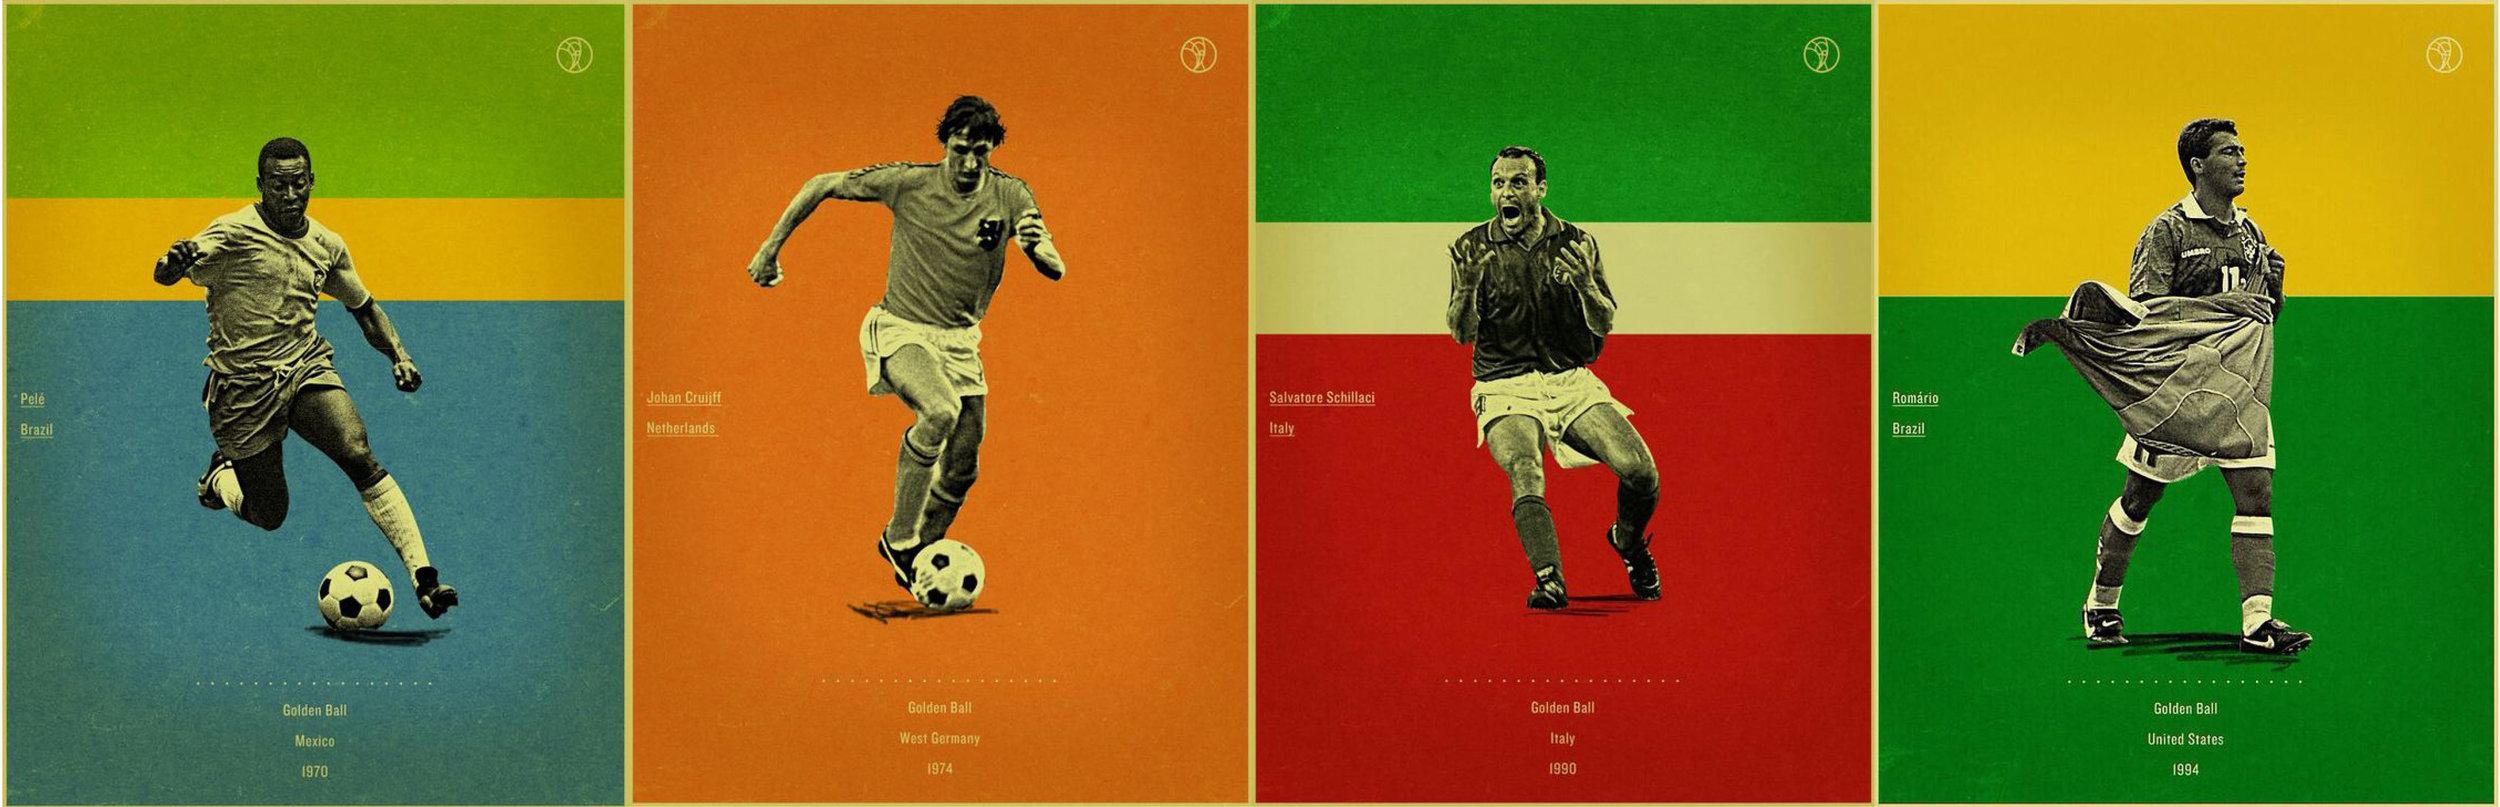 world cup retro montage